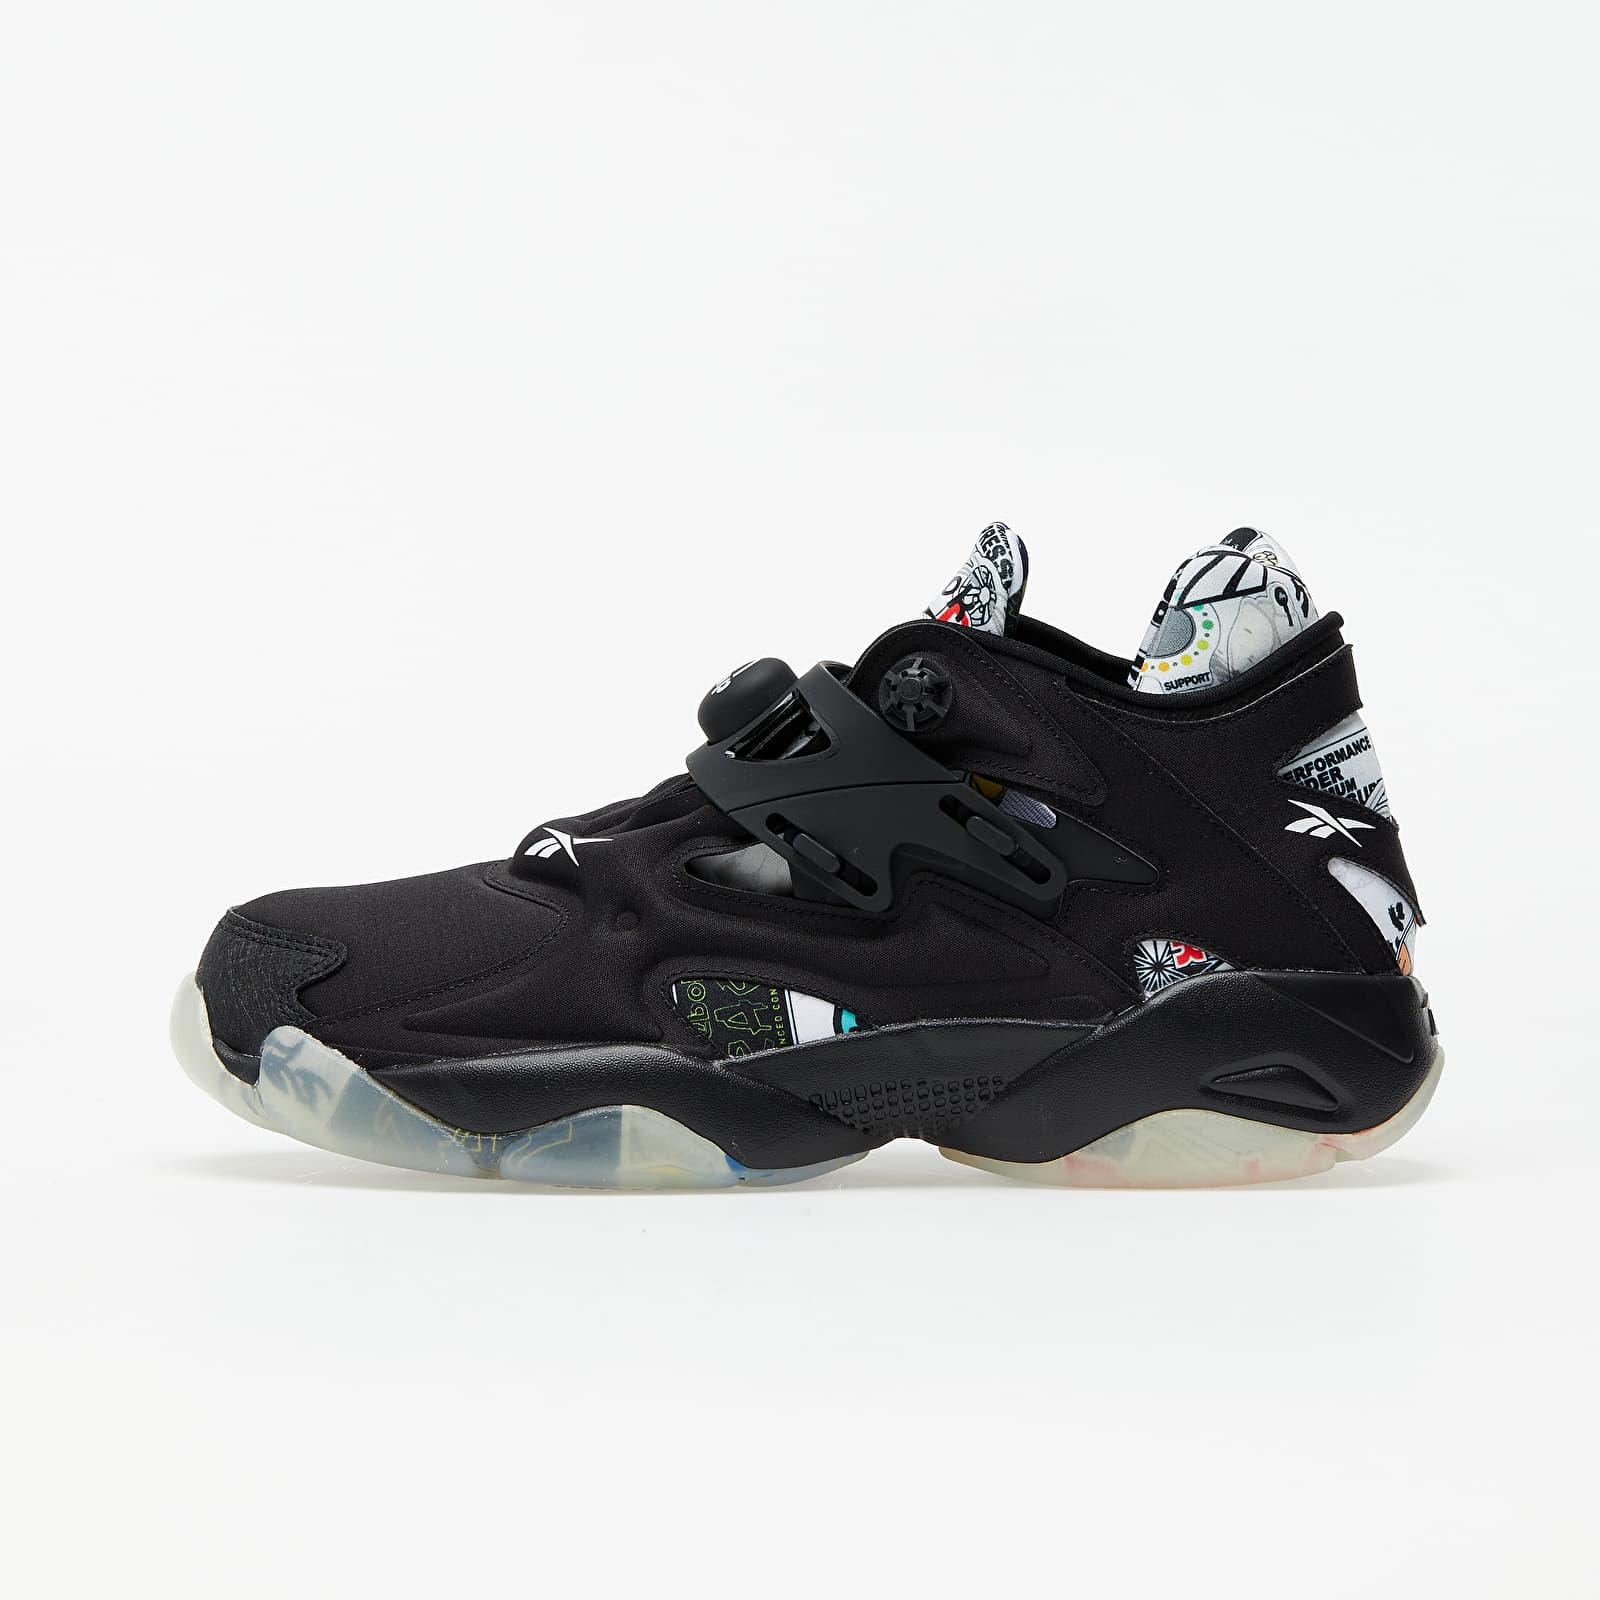 Chaussures et baskets homme Reebok Pump Court Black/ Black/ Black